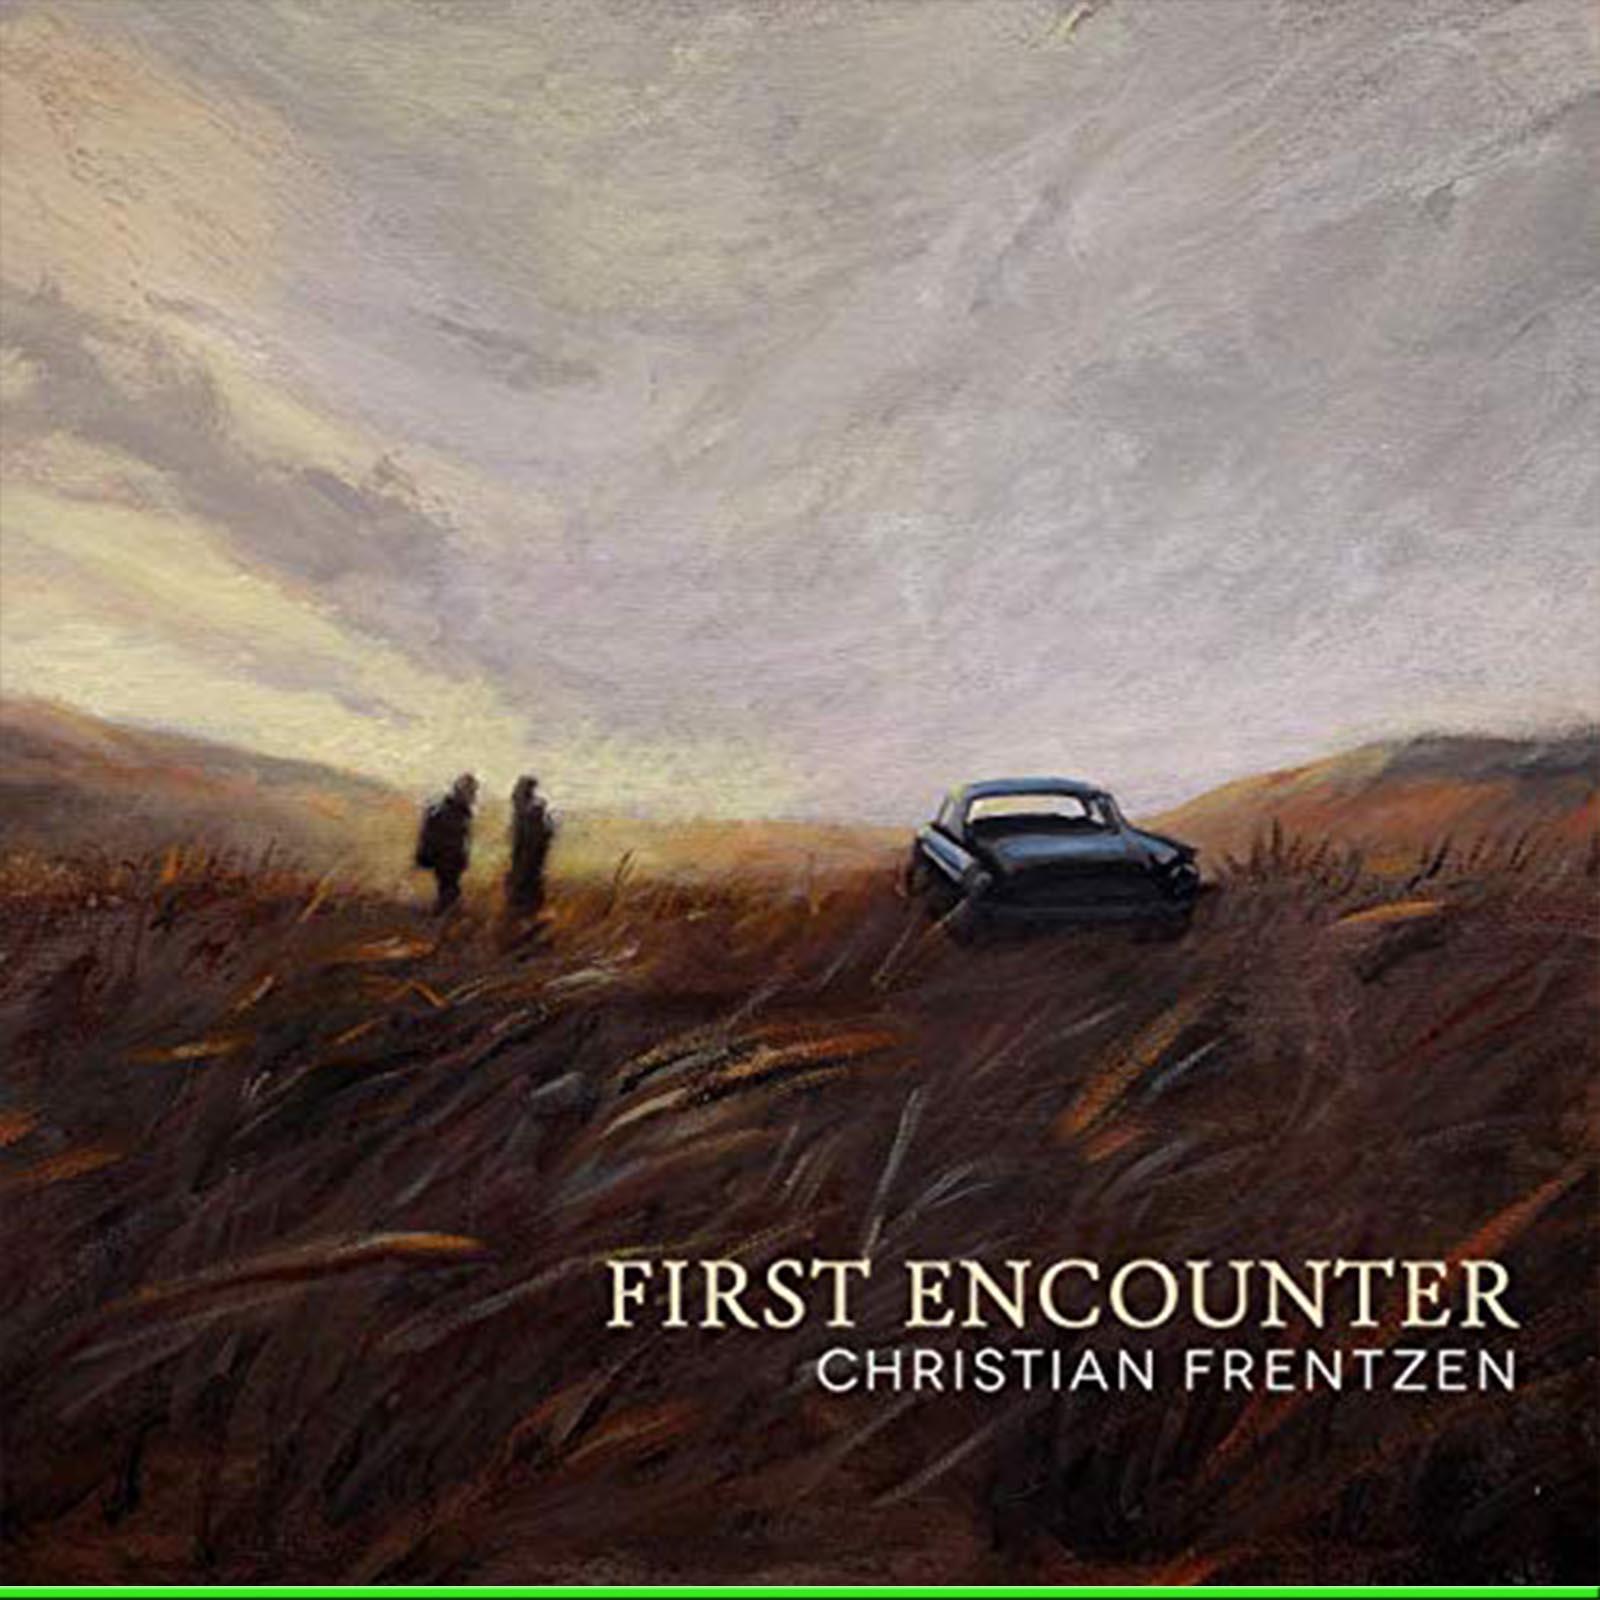 CHRISTIAN FRENTZEN - First Encounter cover